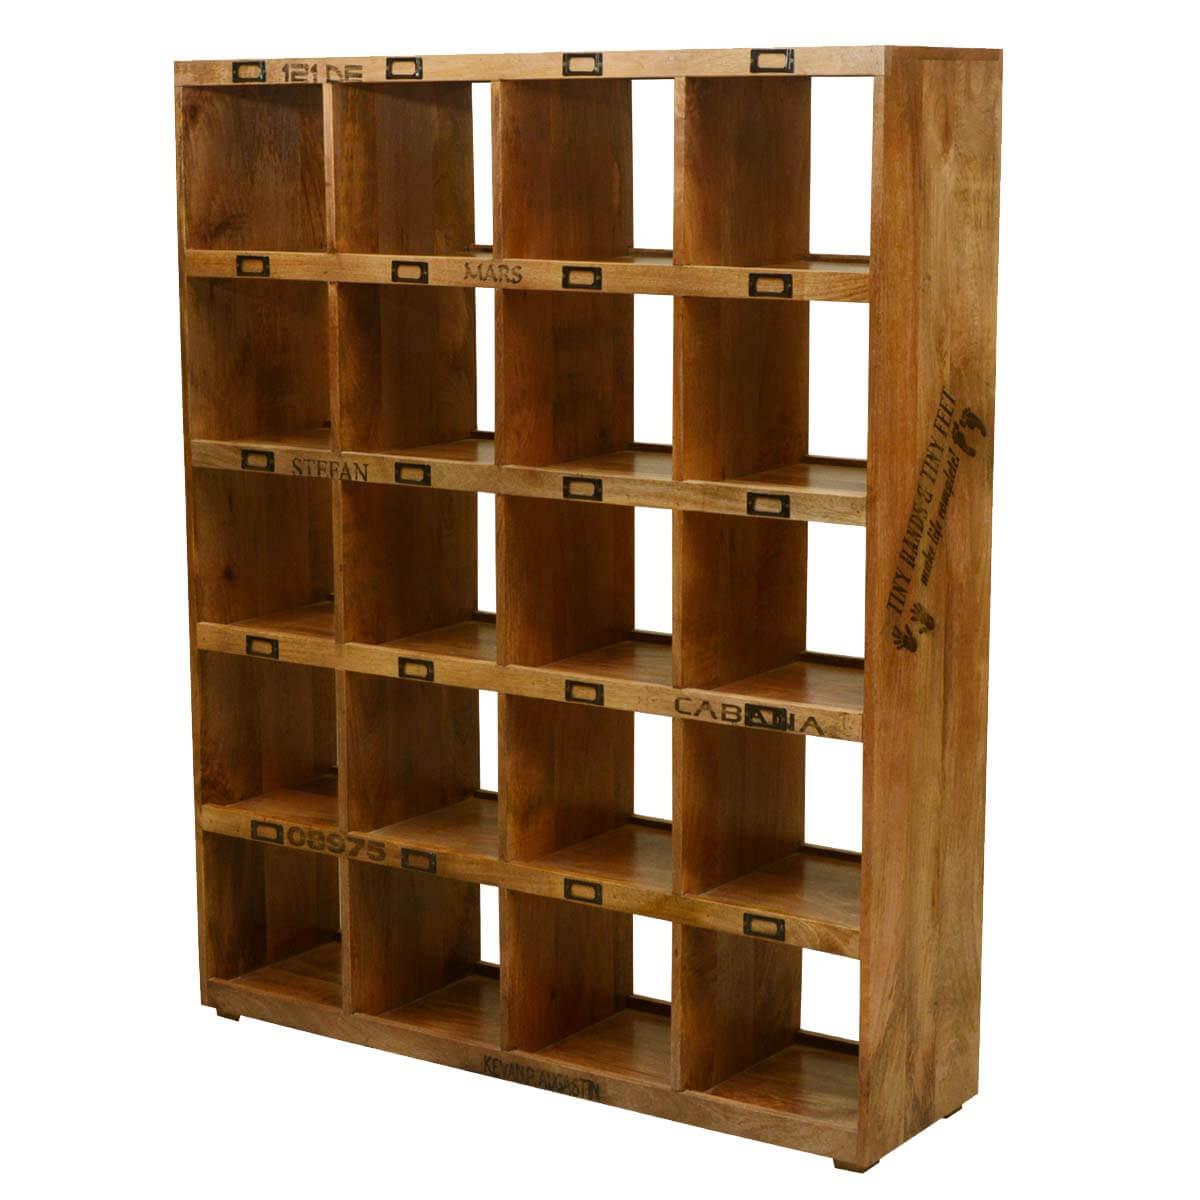 Surrey 20 Open Shelf Rustic Solid Wood Cube Bookcase